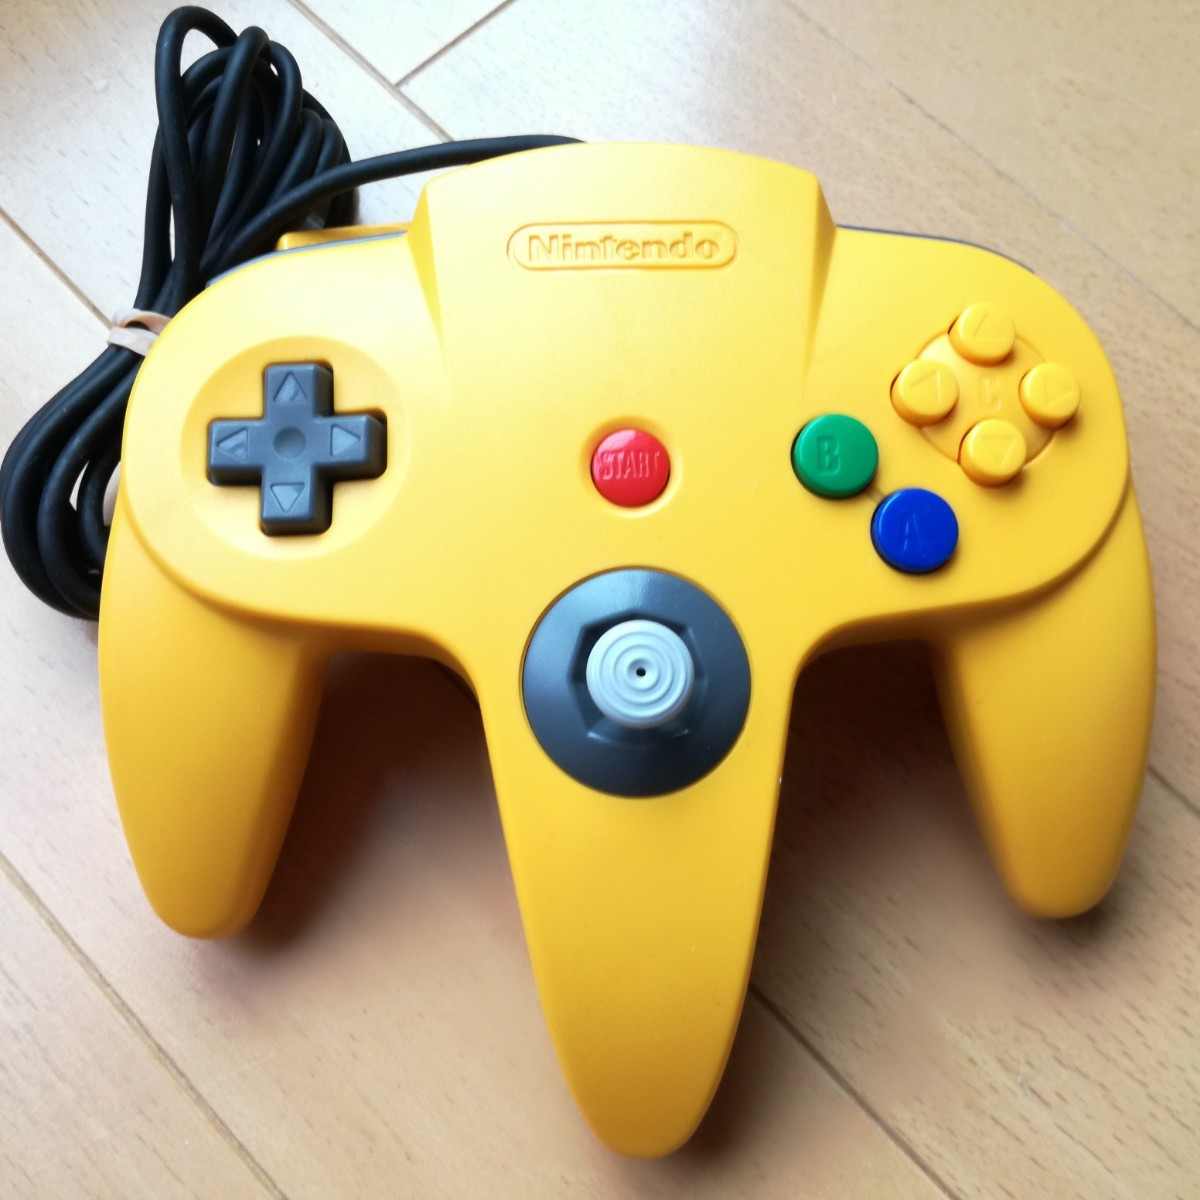 NINTENDO64 イエロー 純正コントローラー ニンテンドー64 任天堂64 ニンテンドー Nintendo 動作確認済み